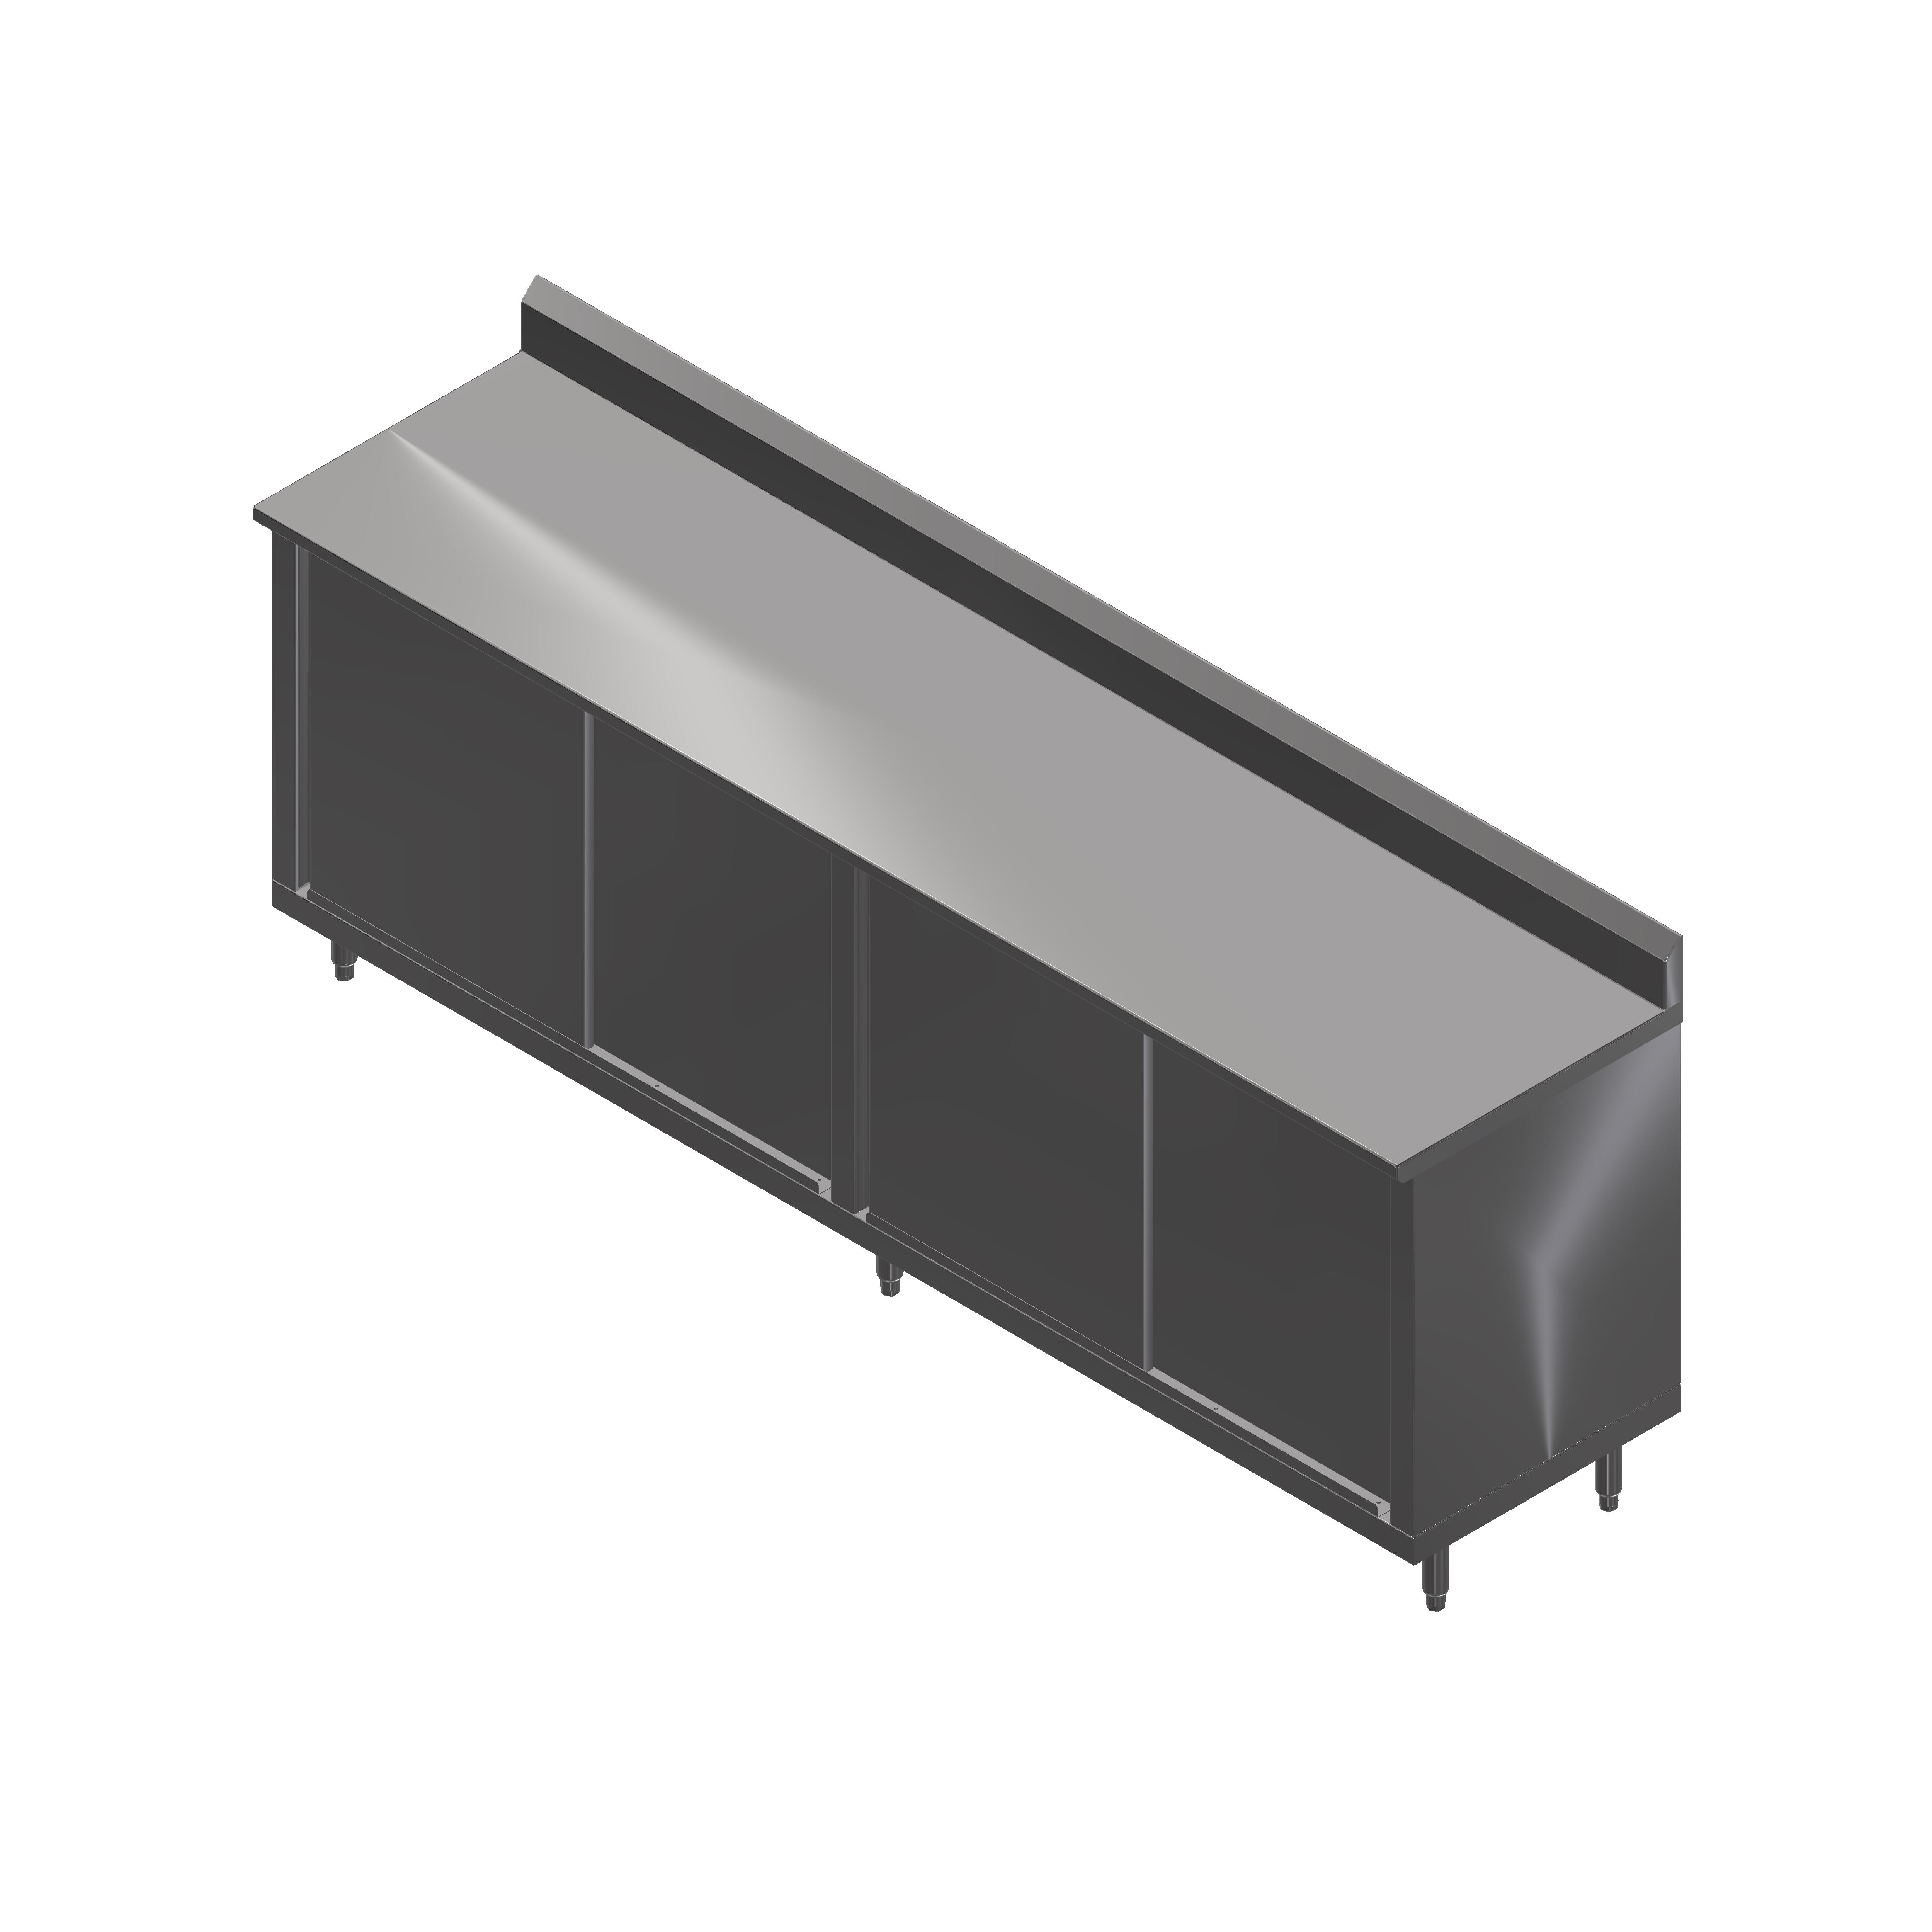 John Boos 4CS4R5-36120 work table, cabinet base sliding doors